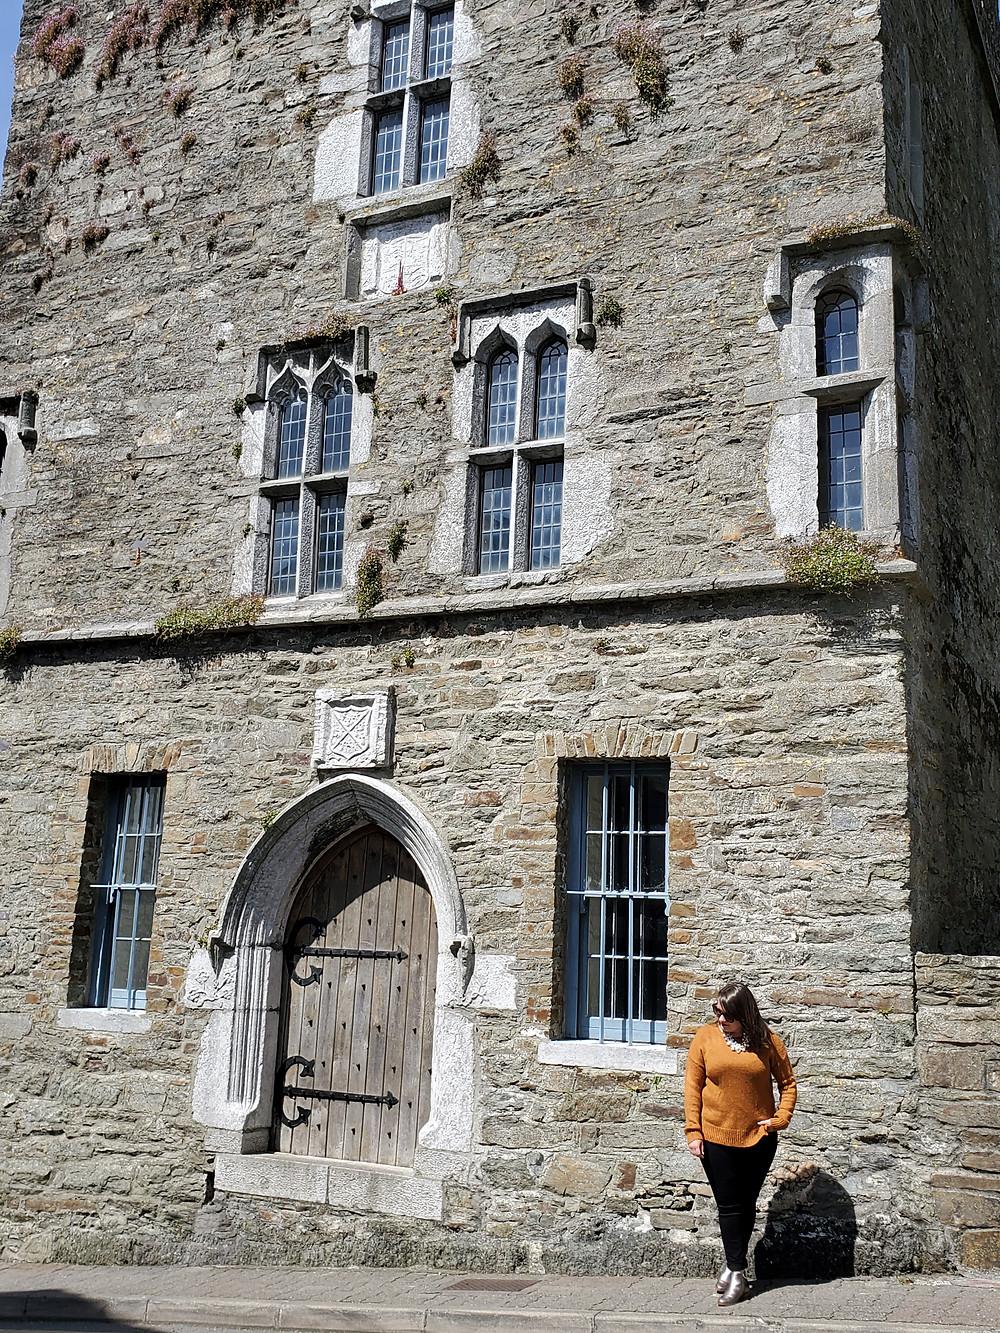 desmond castle in kinsale ireland